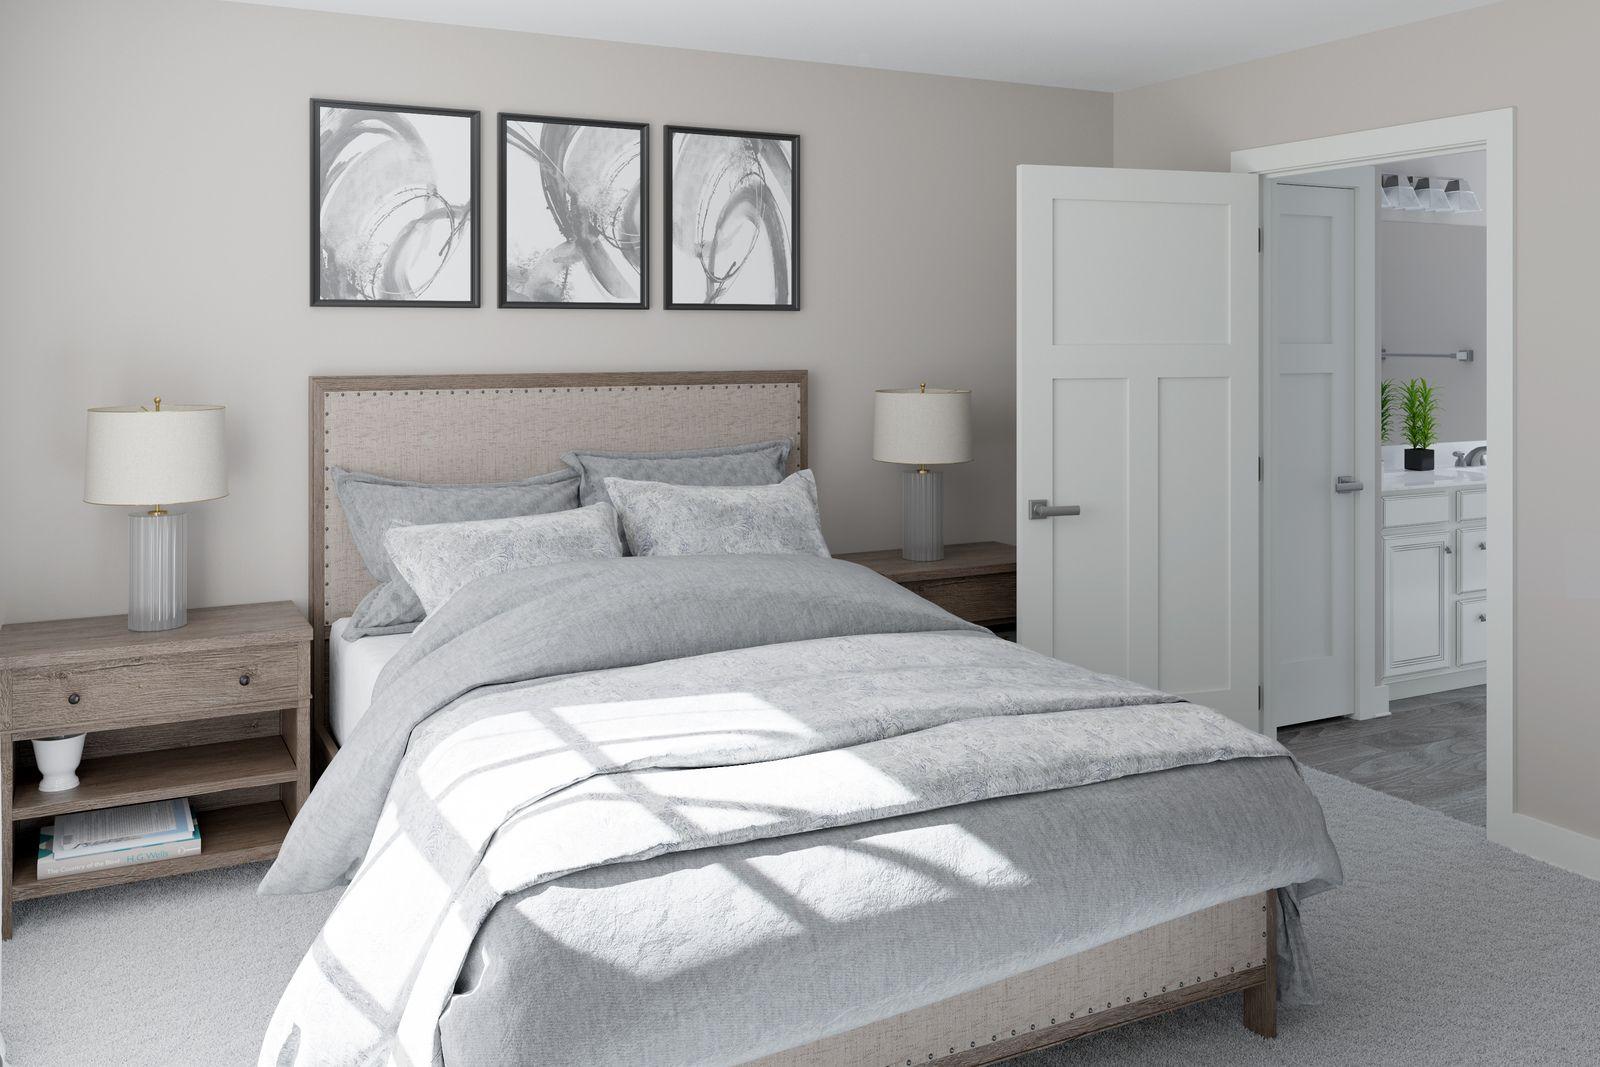 Bedroom featured in the Pisa Torre By Ryan Homes in Ocean City, MD